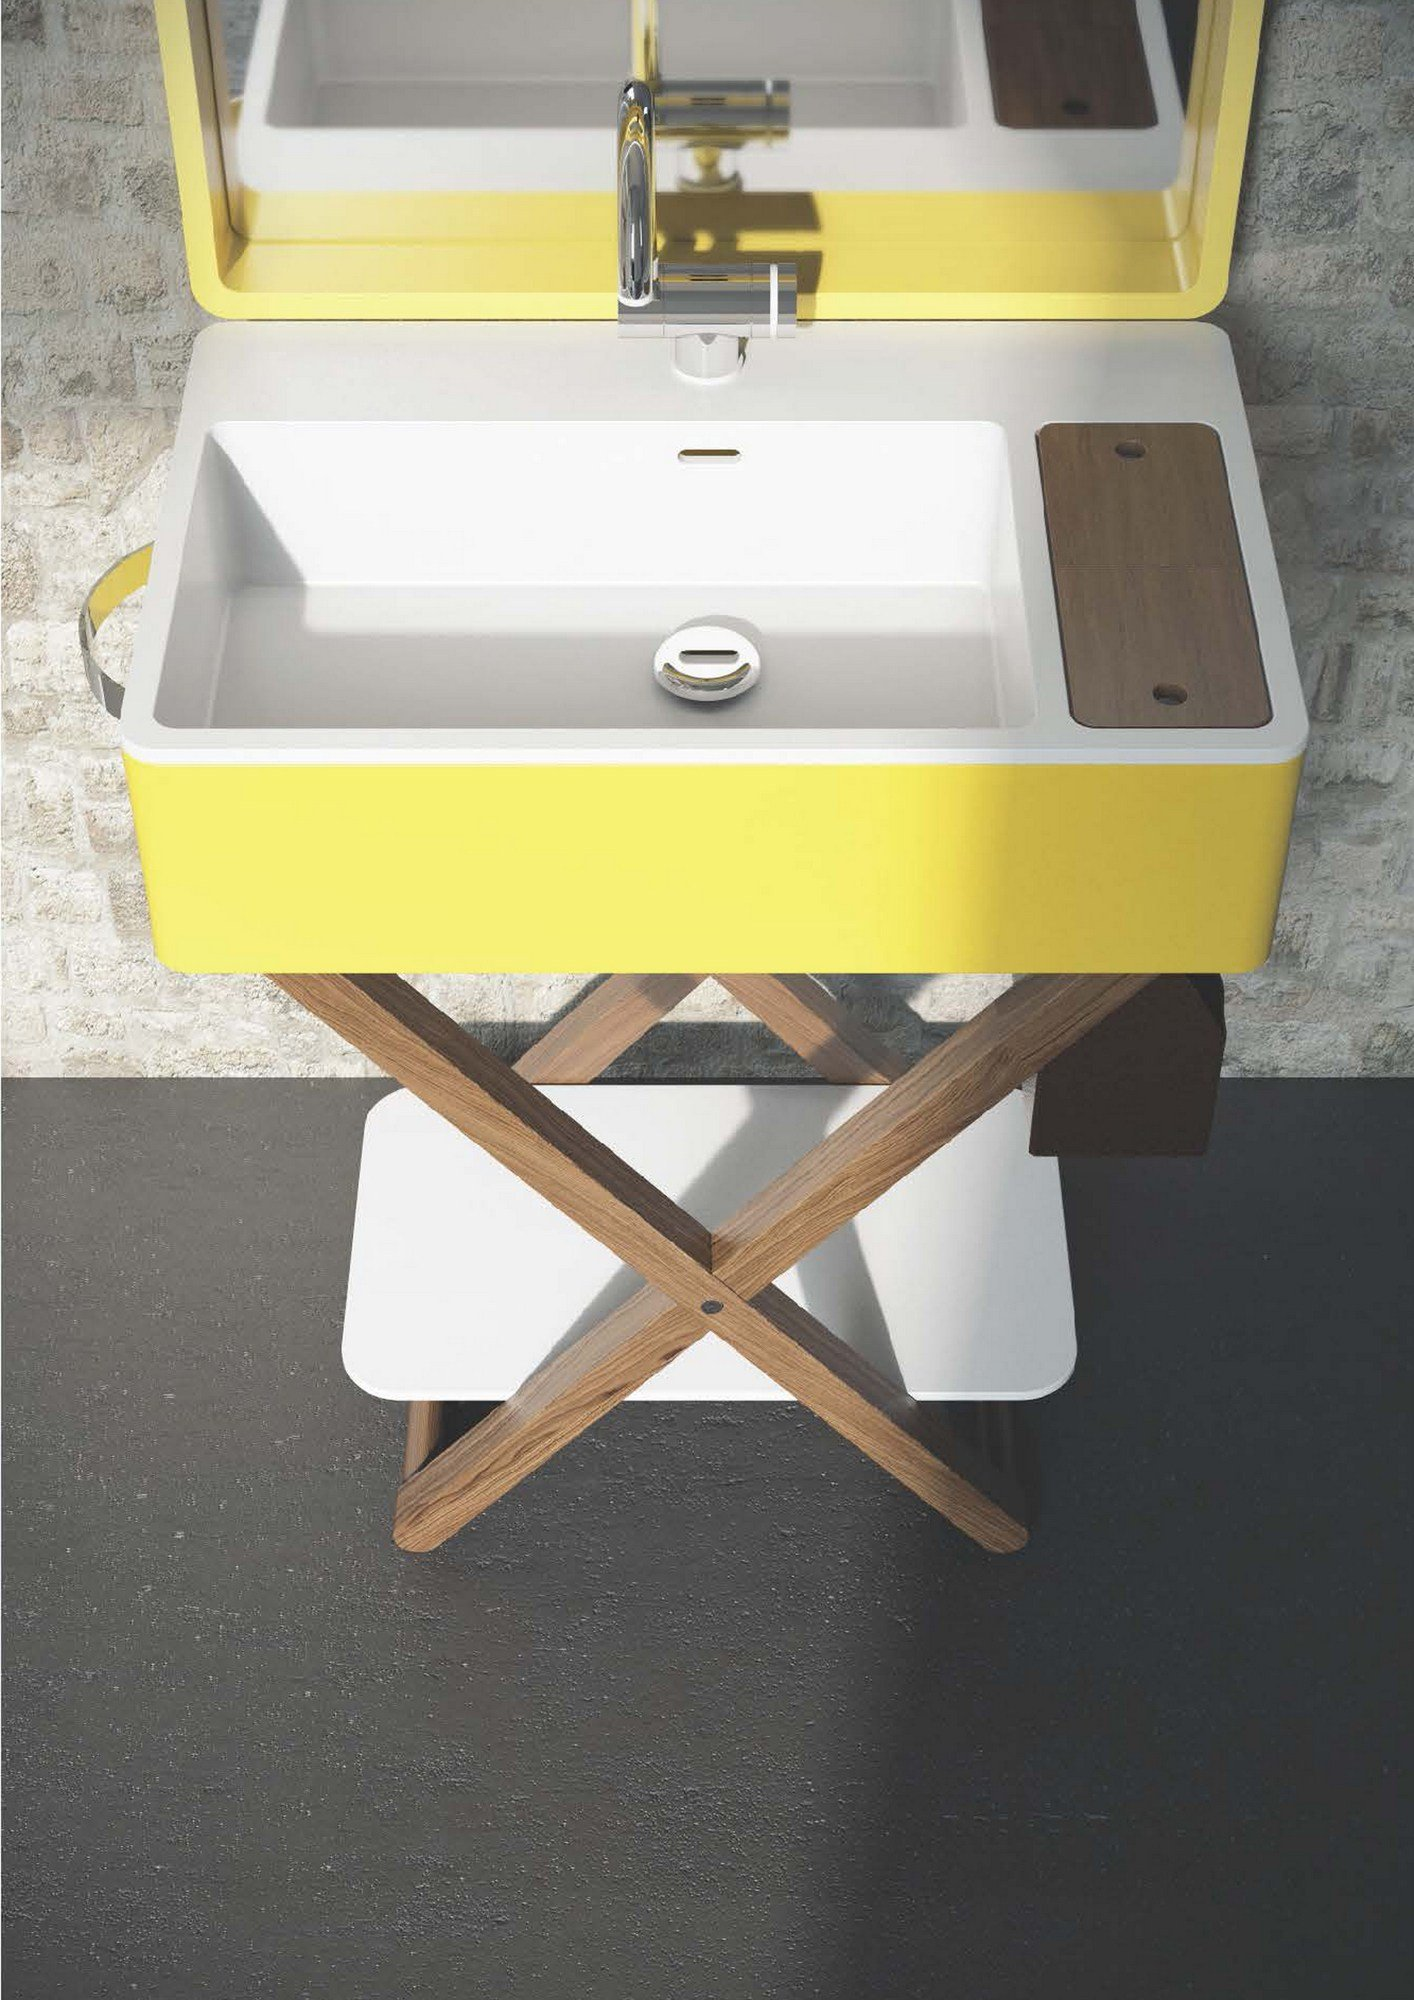 waschbecken mit handtuchhalter my bag by olympia ceramica. Black Bedroom Furniture Sets. Home Design Ideas